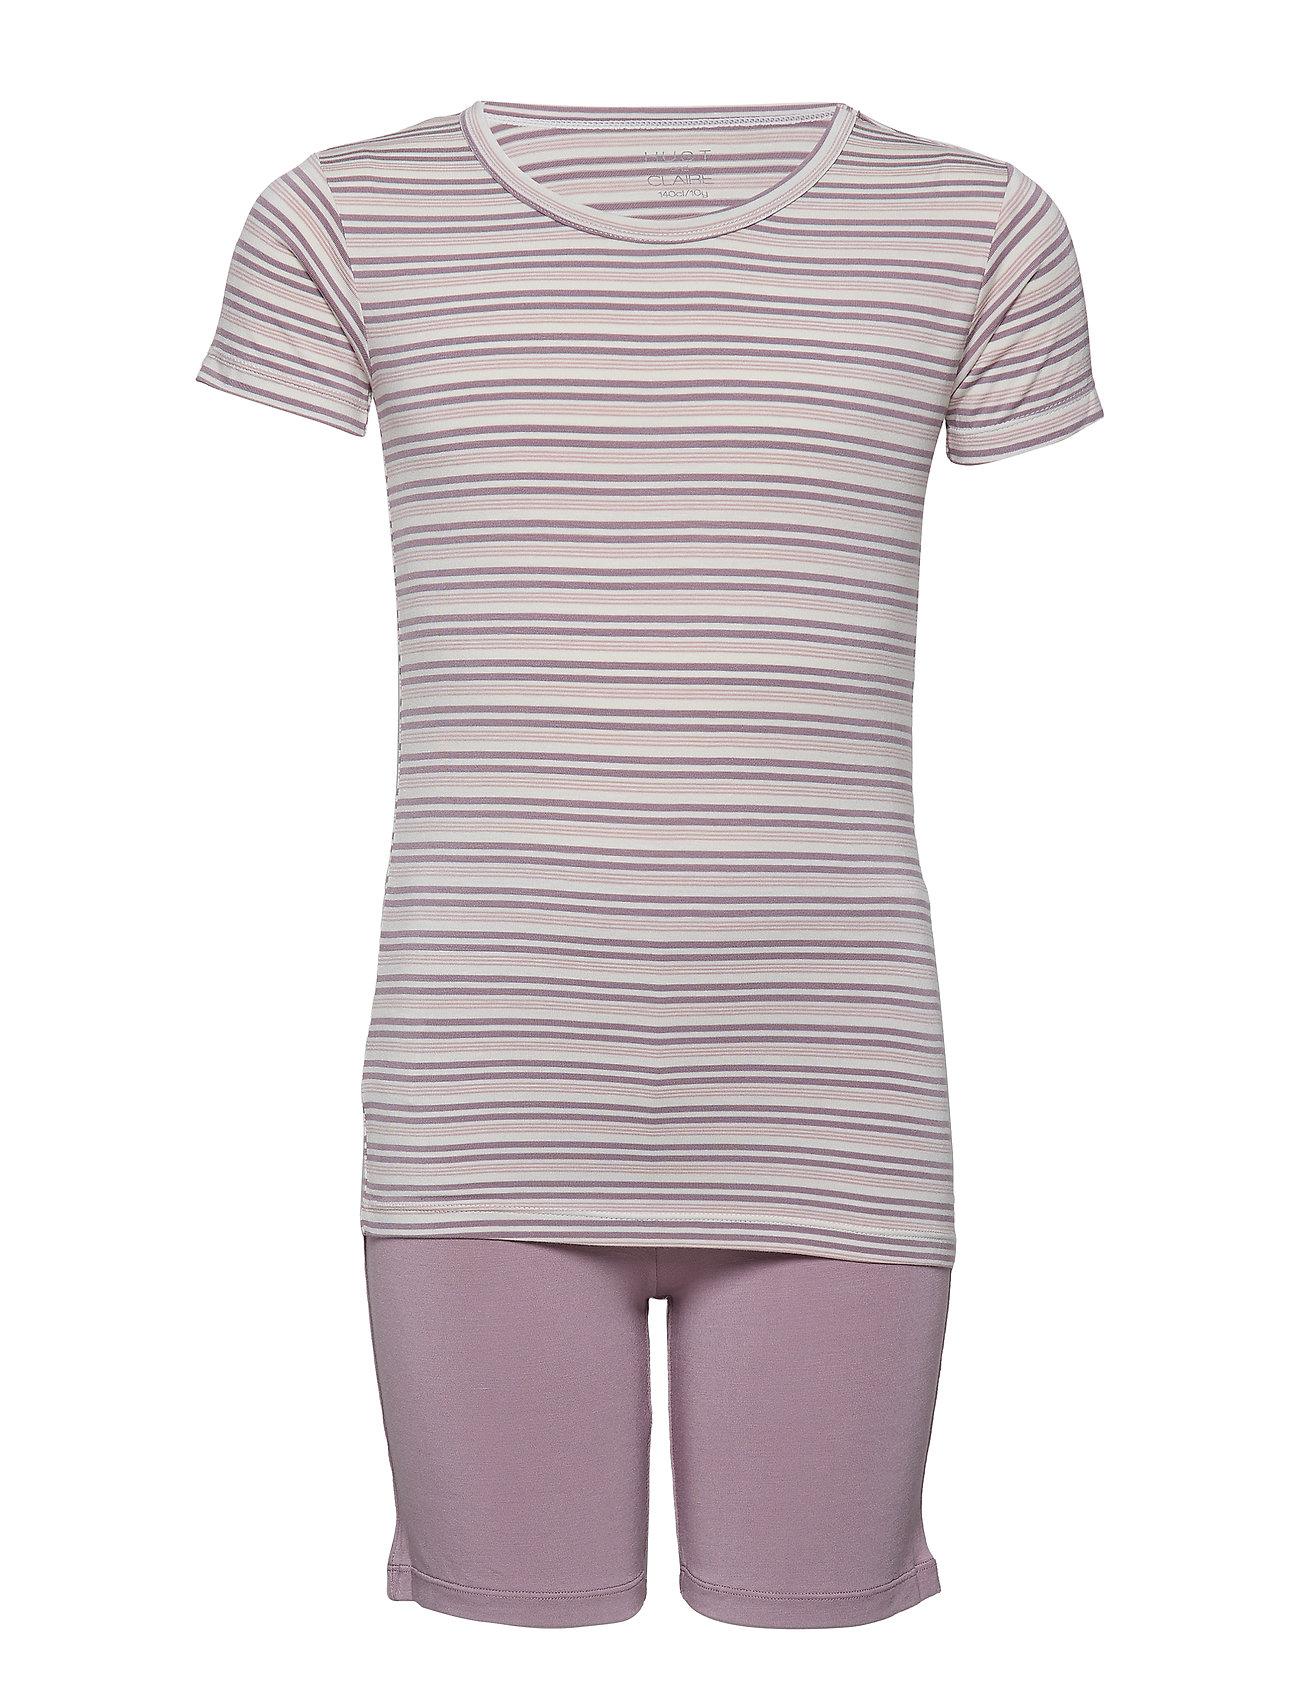 Hust & Claire Fun - Pyjamas - LAVENDER